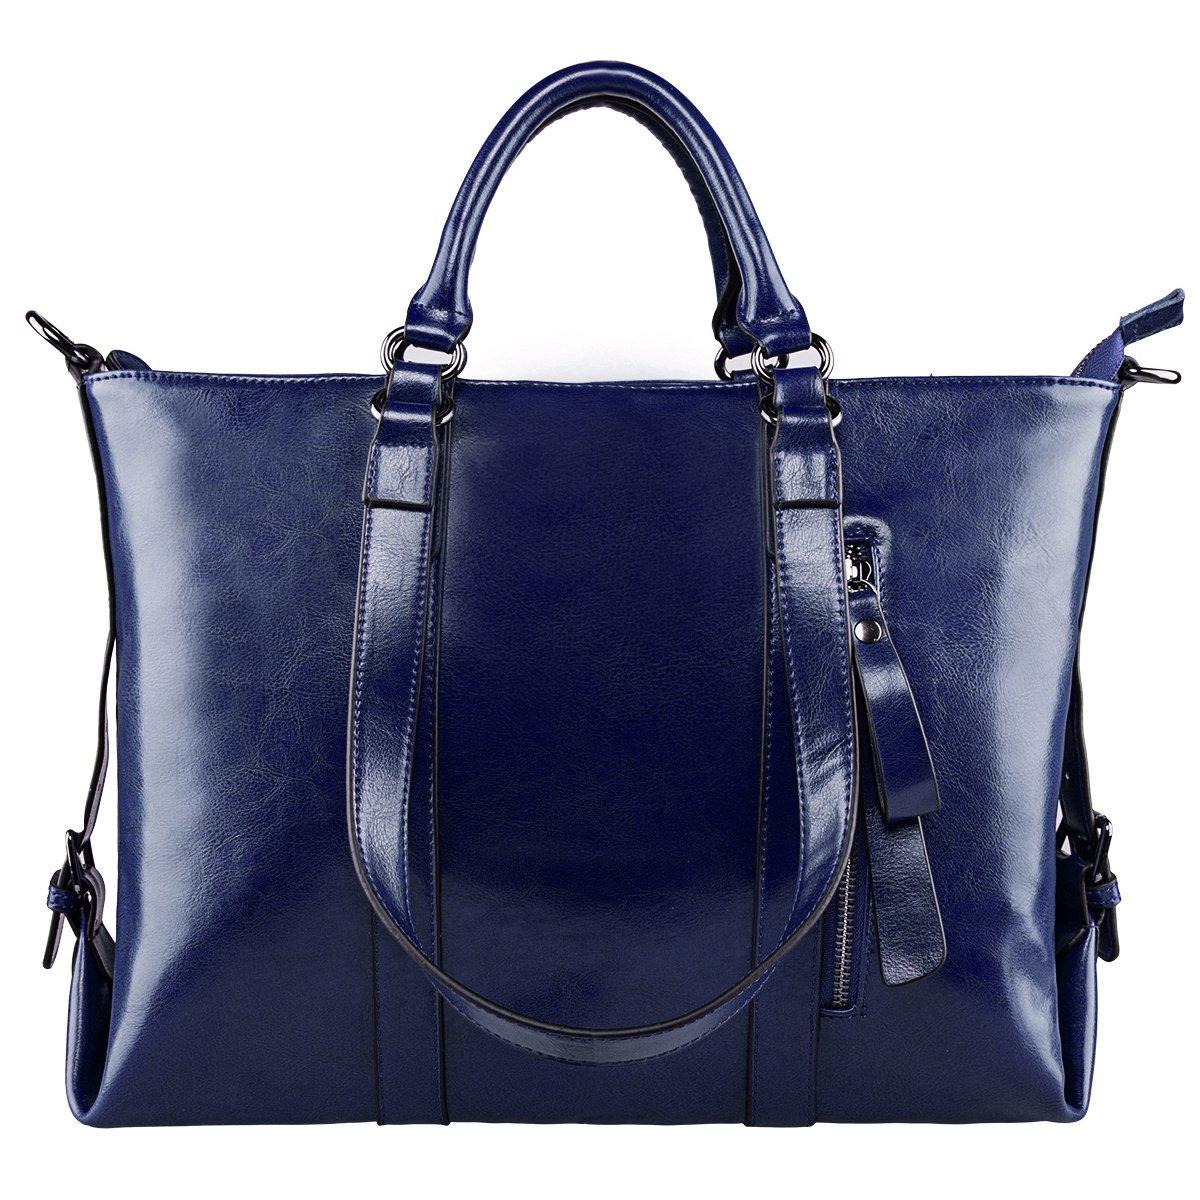 5ab75568ed Amazon.com  S-ZONE 3-Way Women Genuine Leather Shoulder Bag Work Tote  Handbag  Clothing